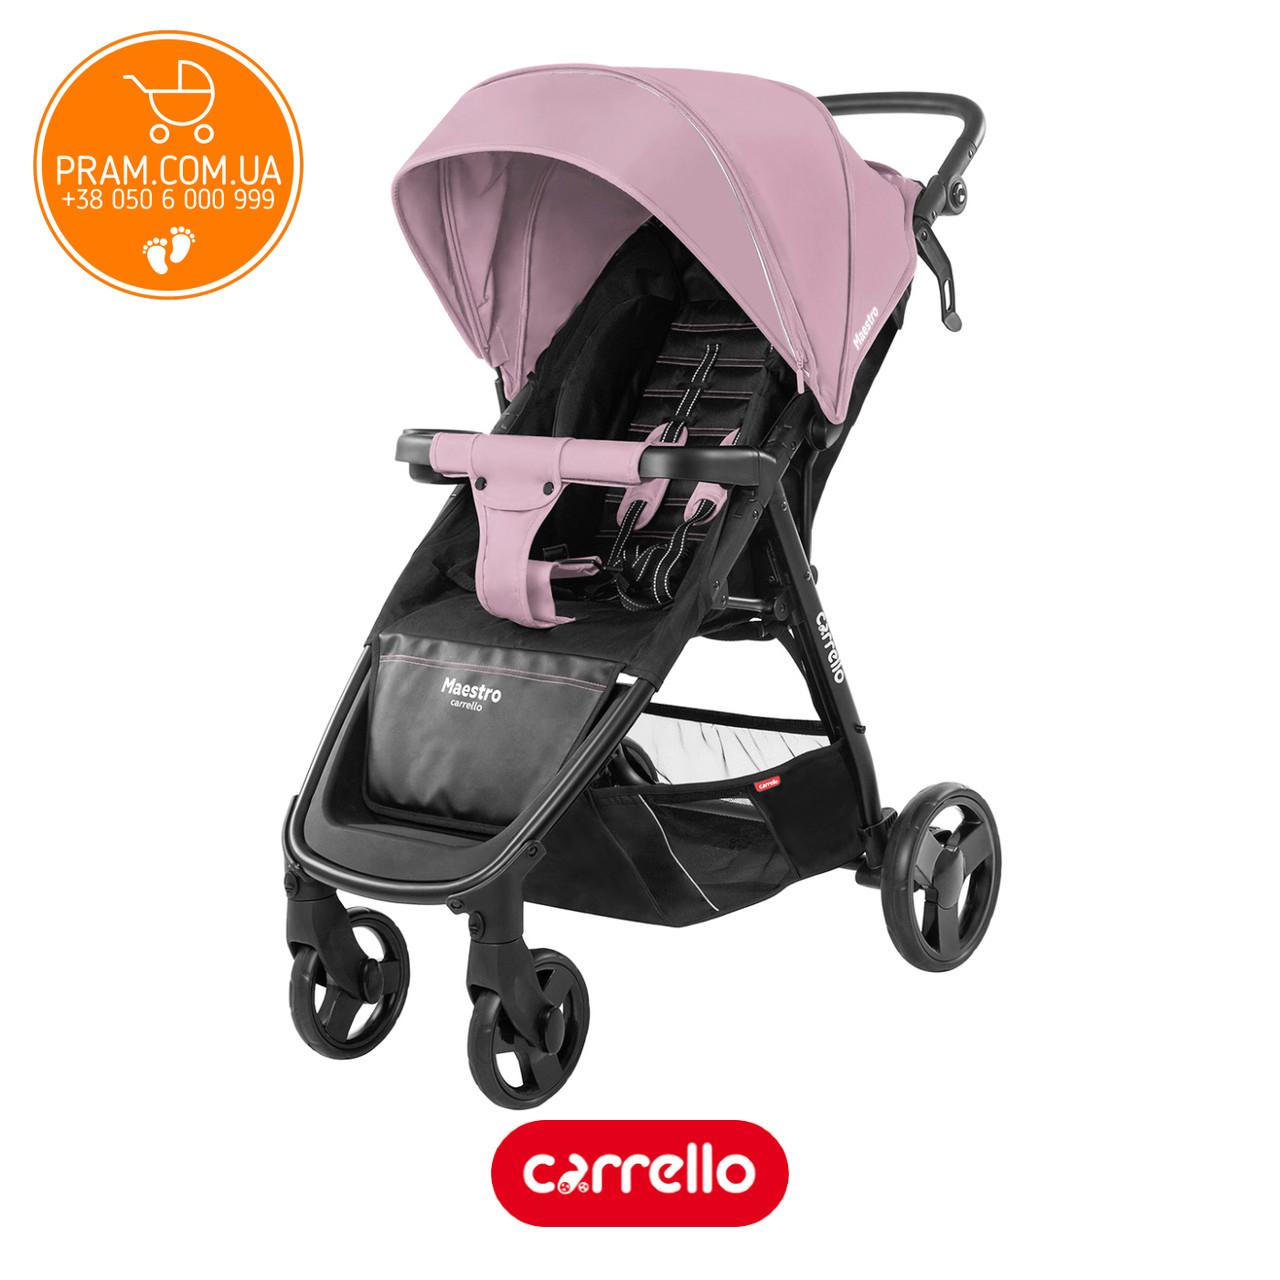 CARRELLO MAESTRO CRL-1414 прогулочная коляска Cloud Pink Розовый